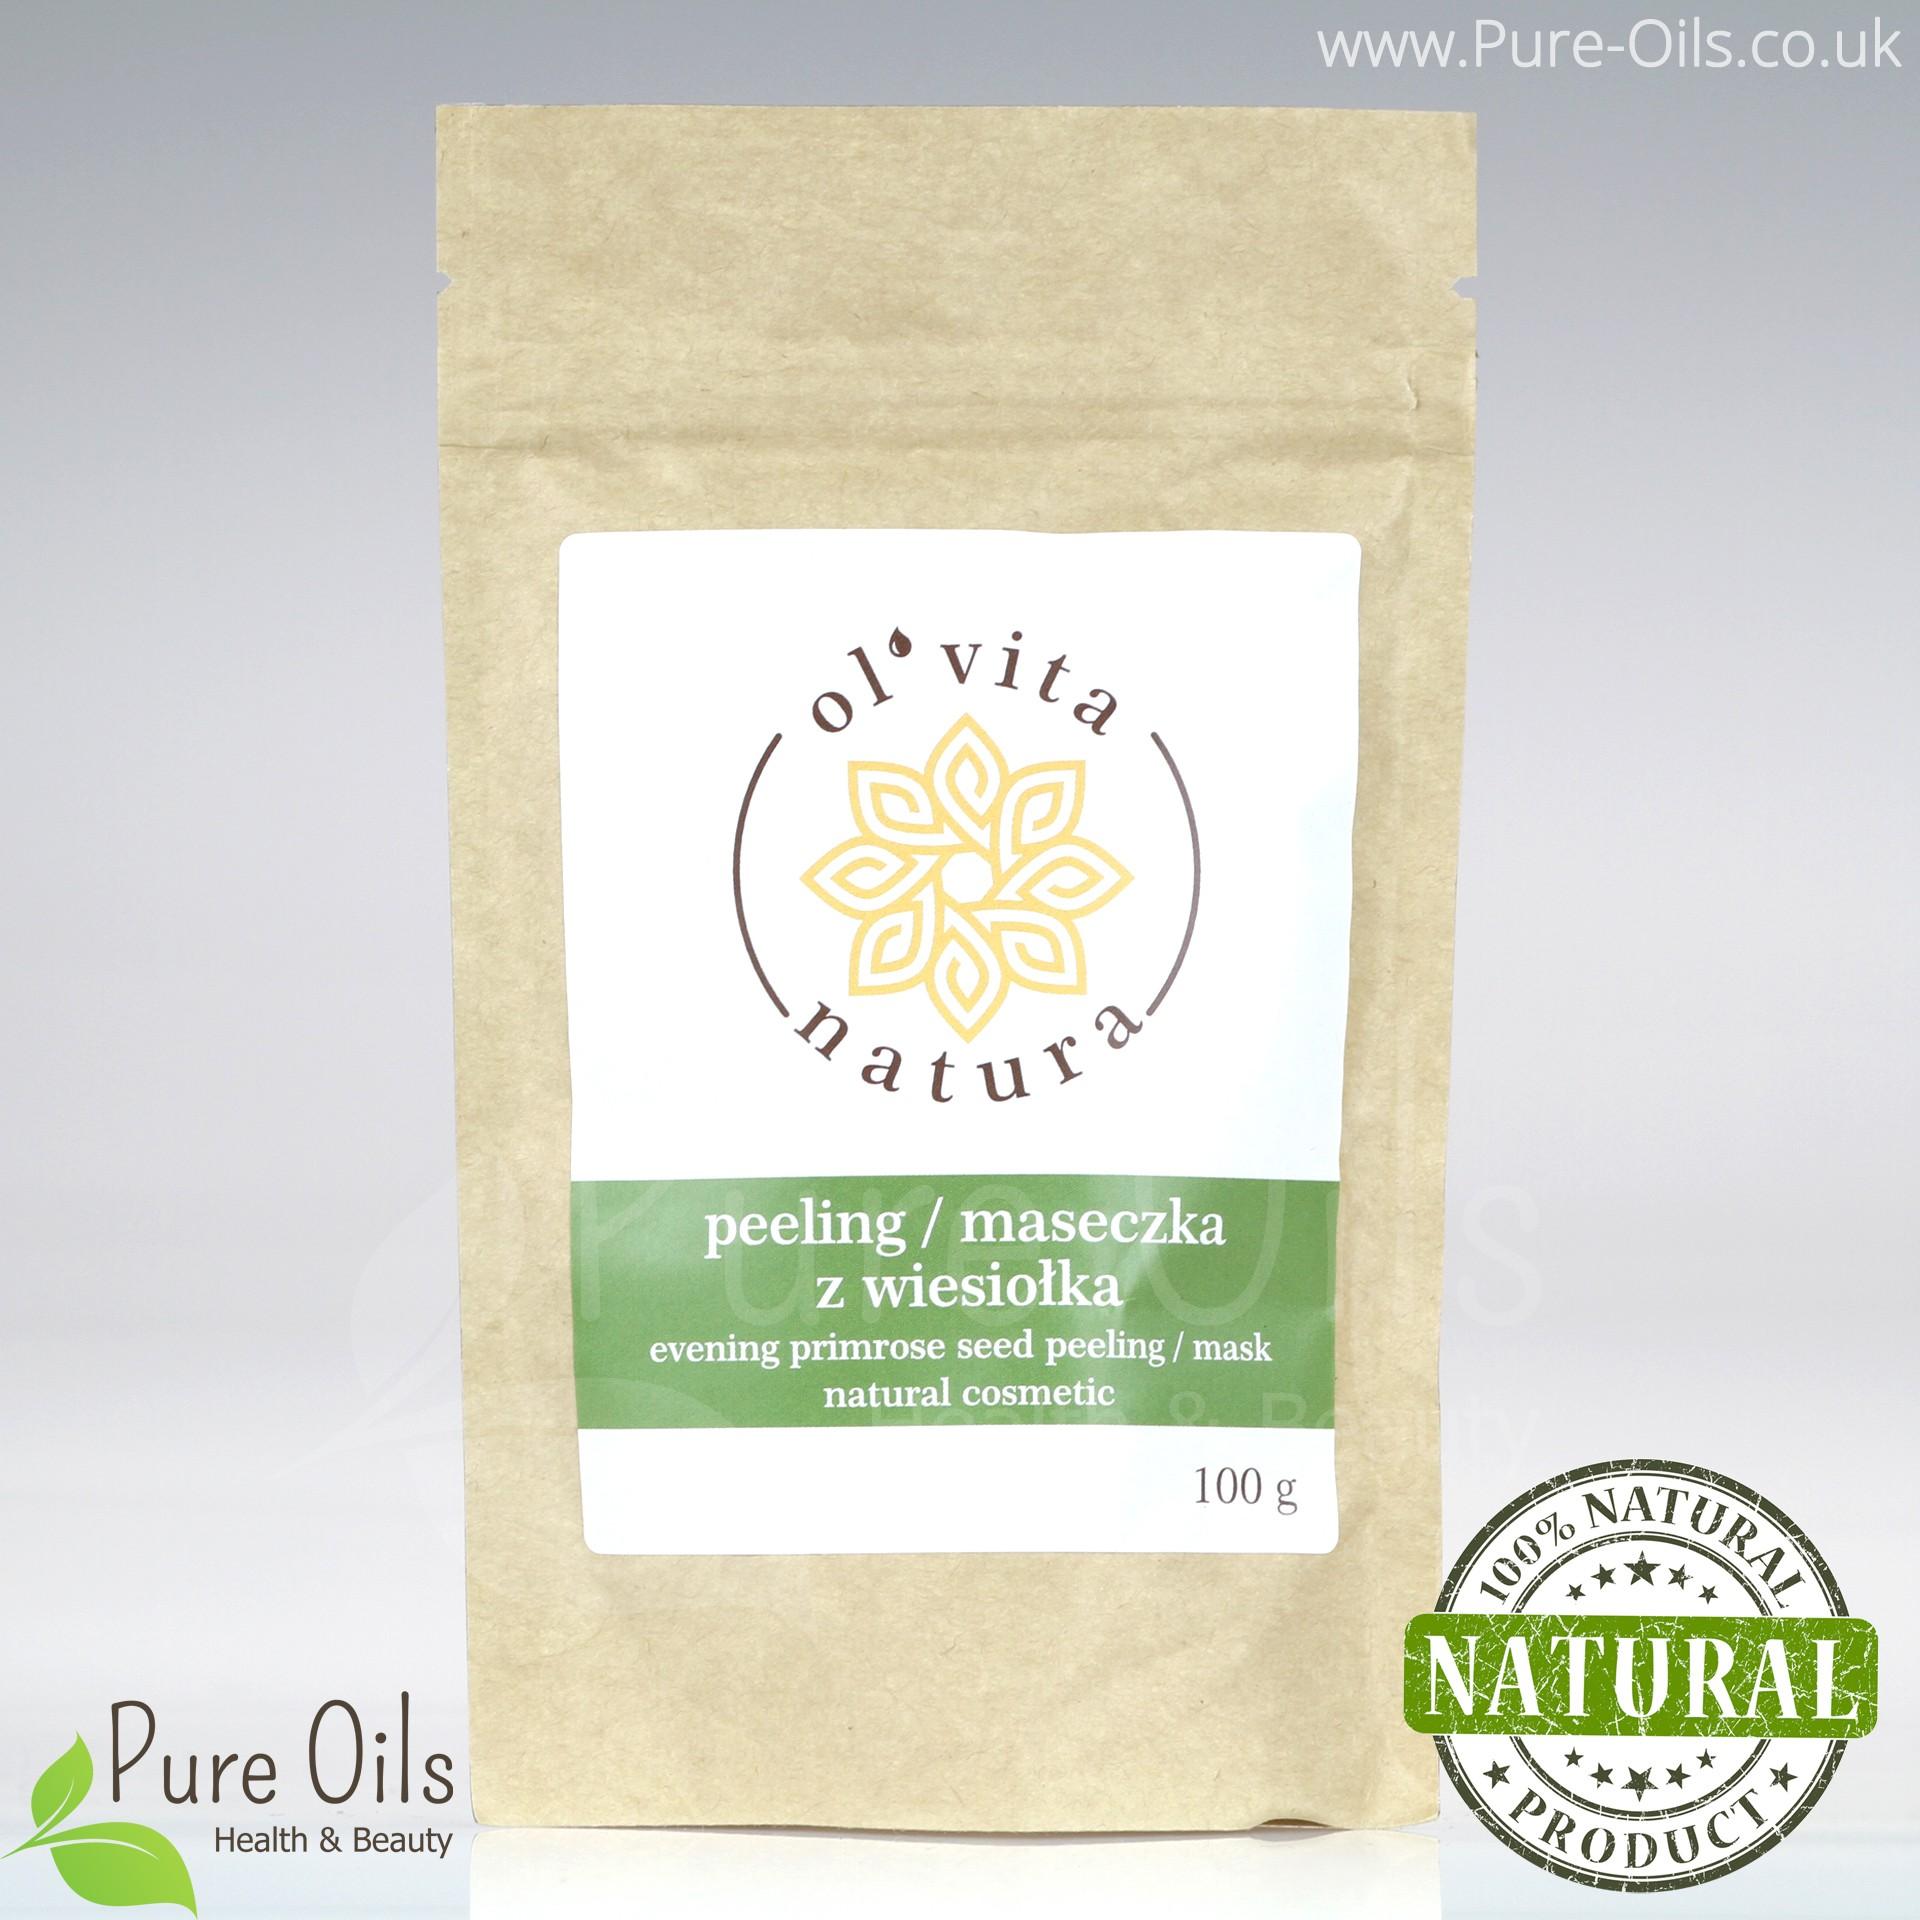 Evening Primrose Seed Peeling /Mask, Powder, Ol'Vita 100g